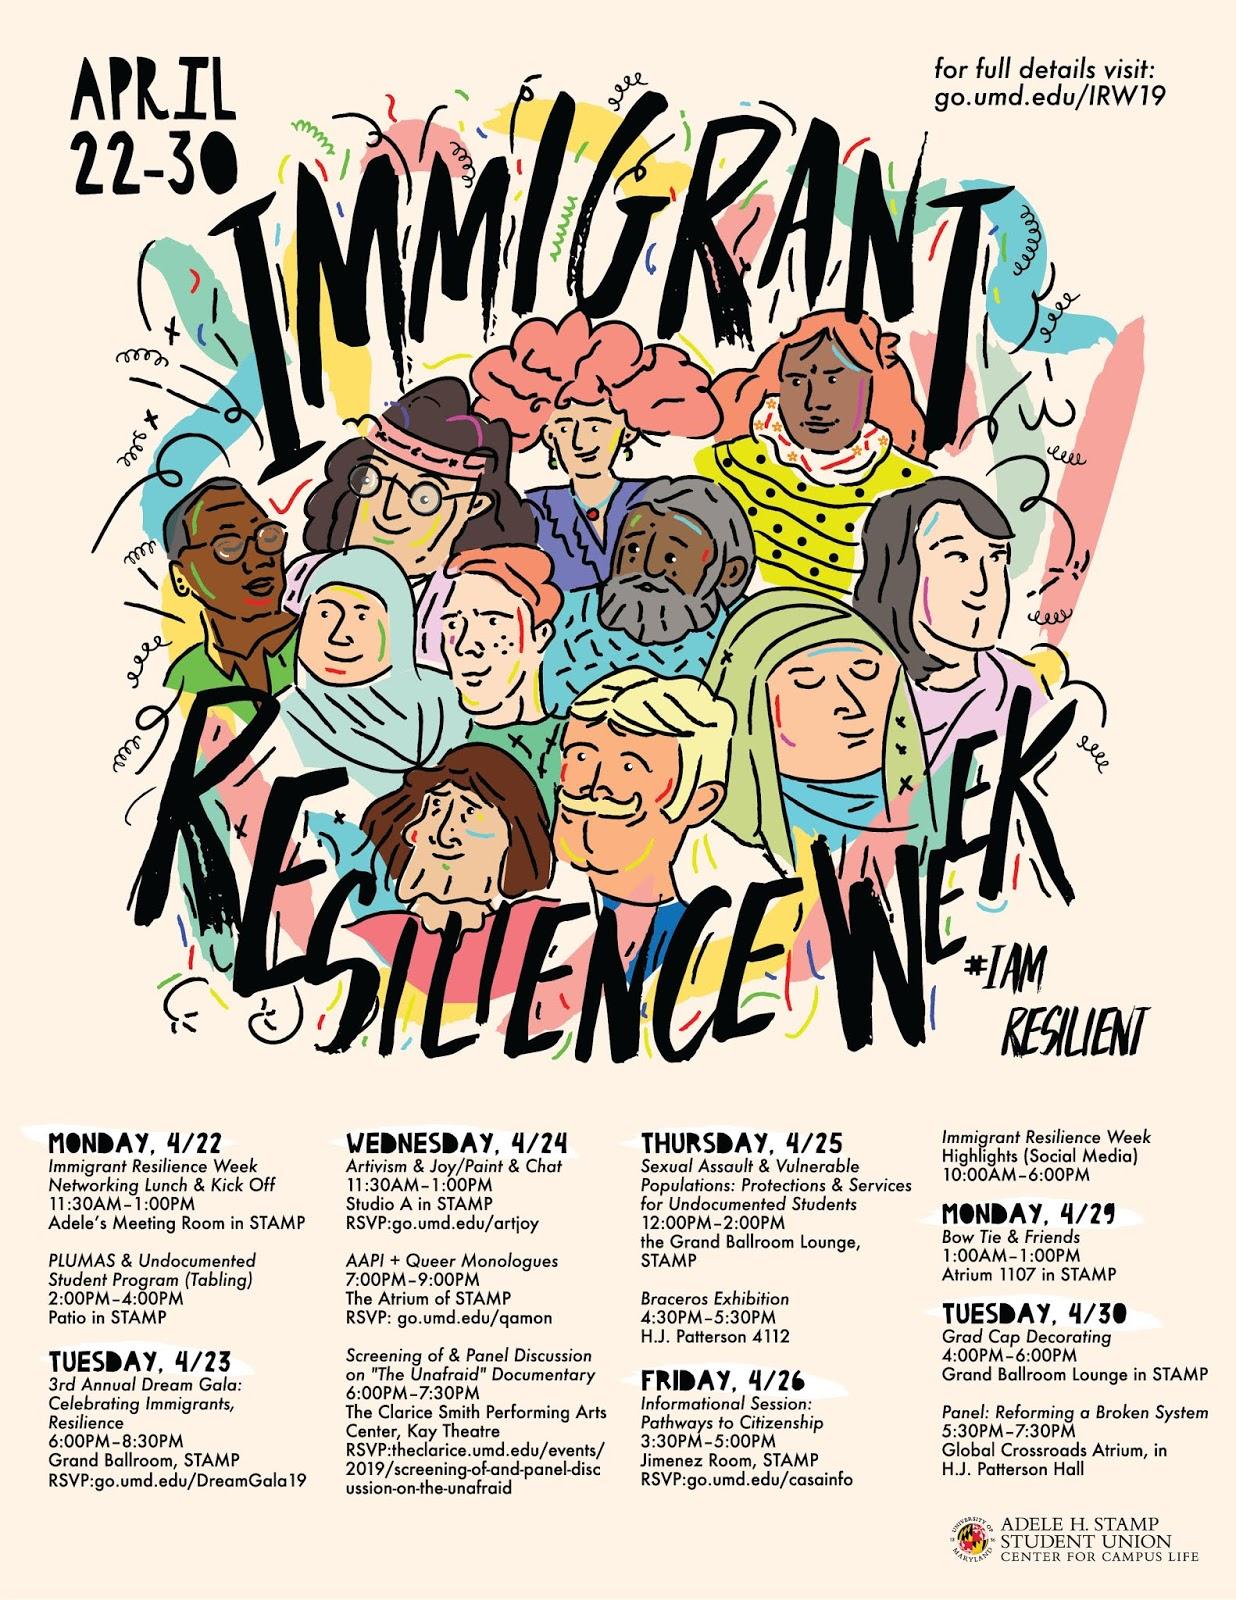 CCJS Undergrad Blog: Immigrant Resilience Week